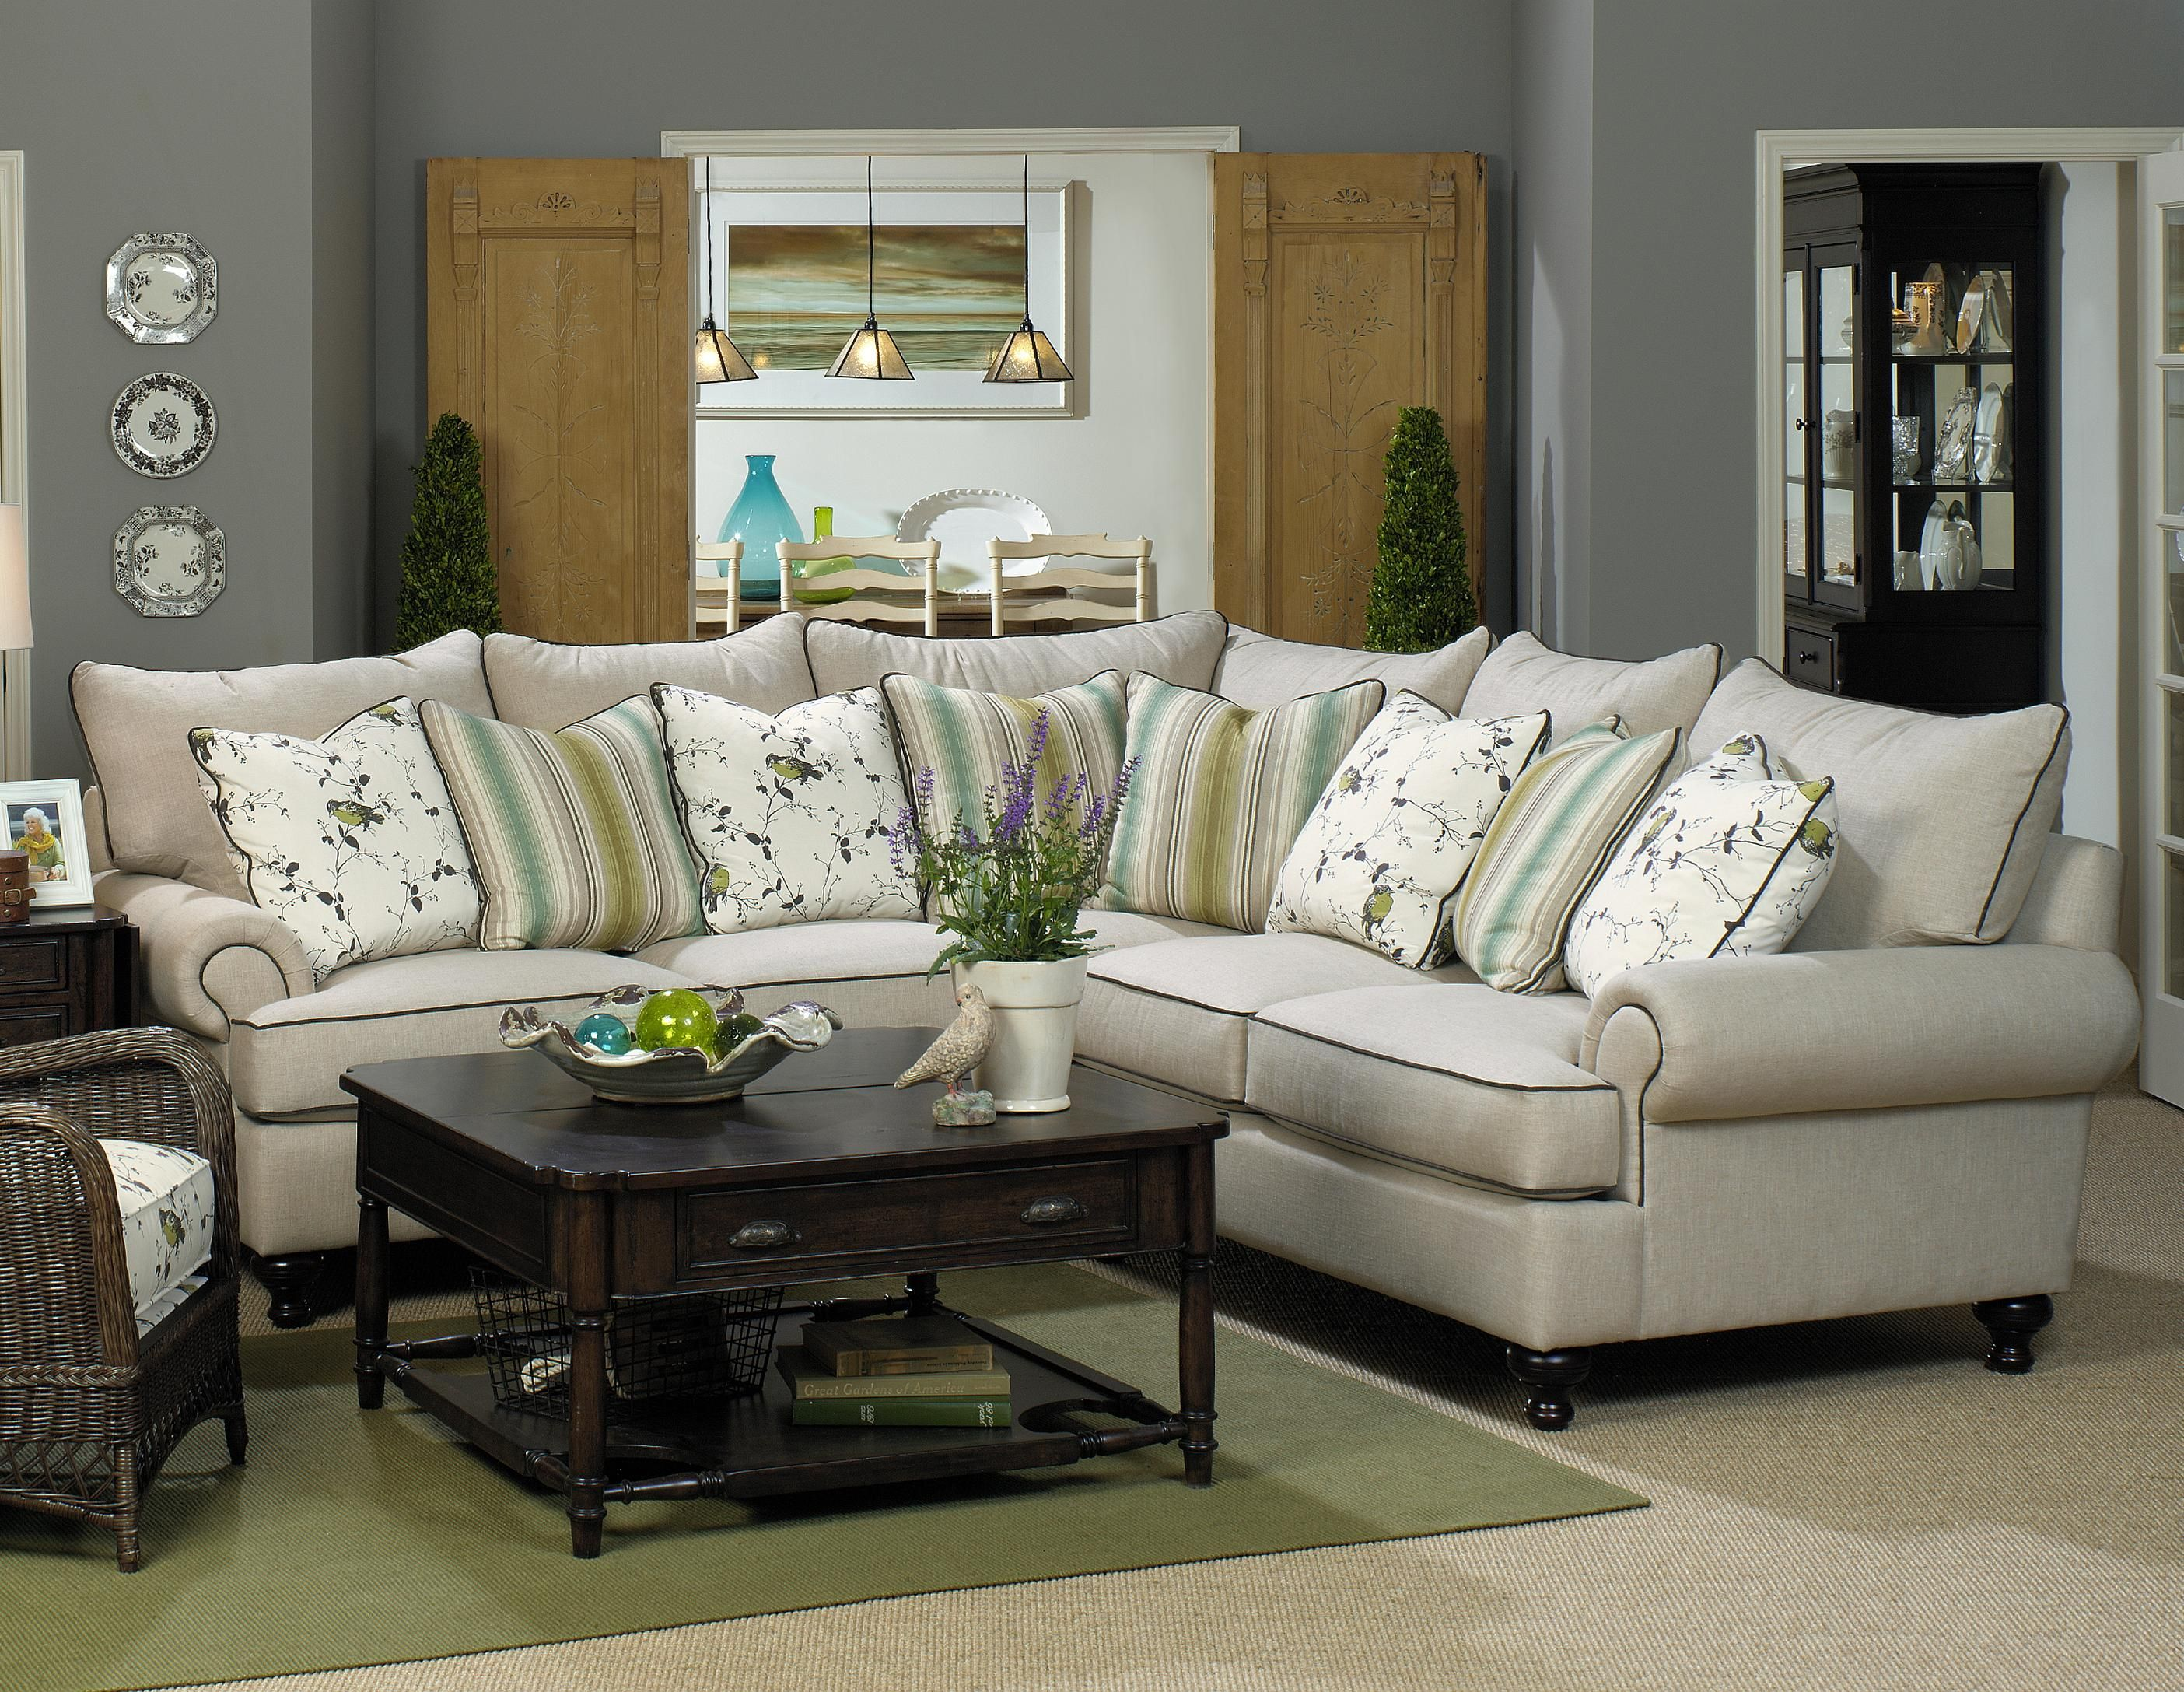 Superbe Paula Deen Home 2 Piece Sectional Sofa By Paula Deen By Universal